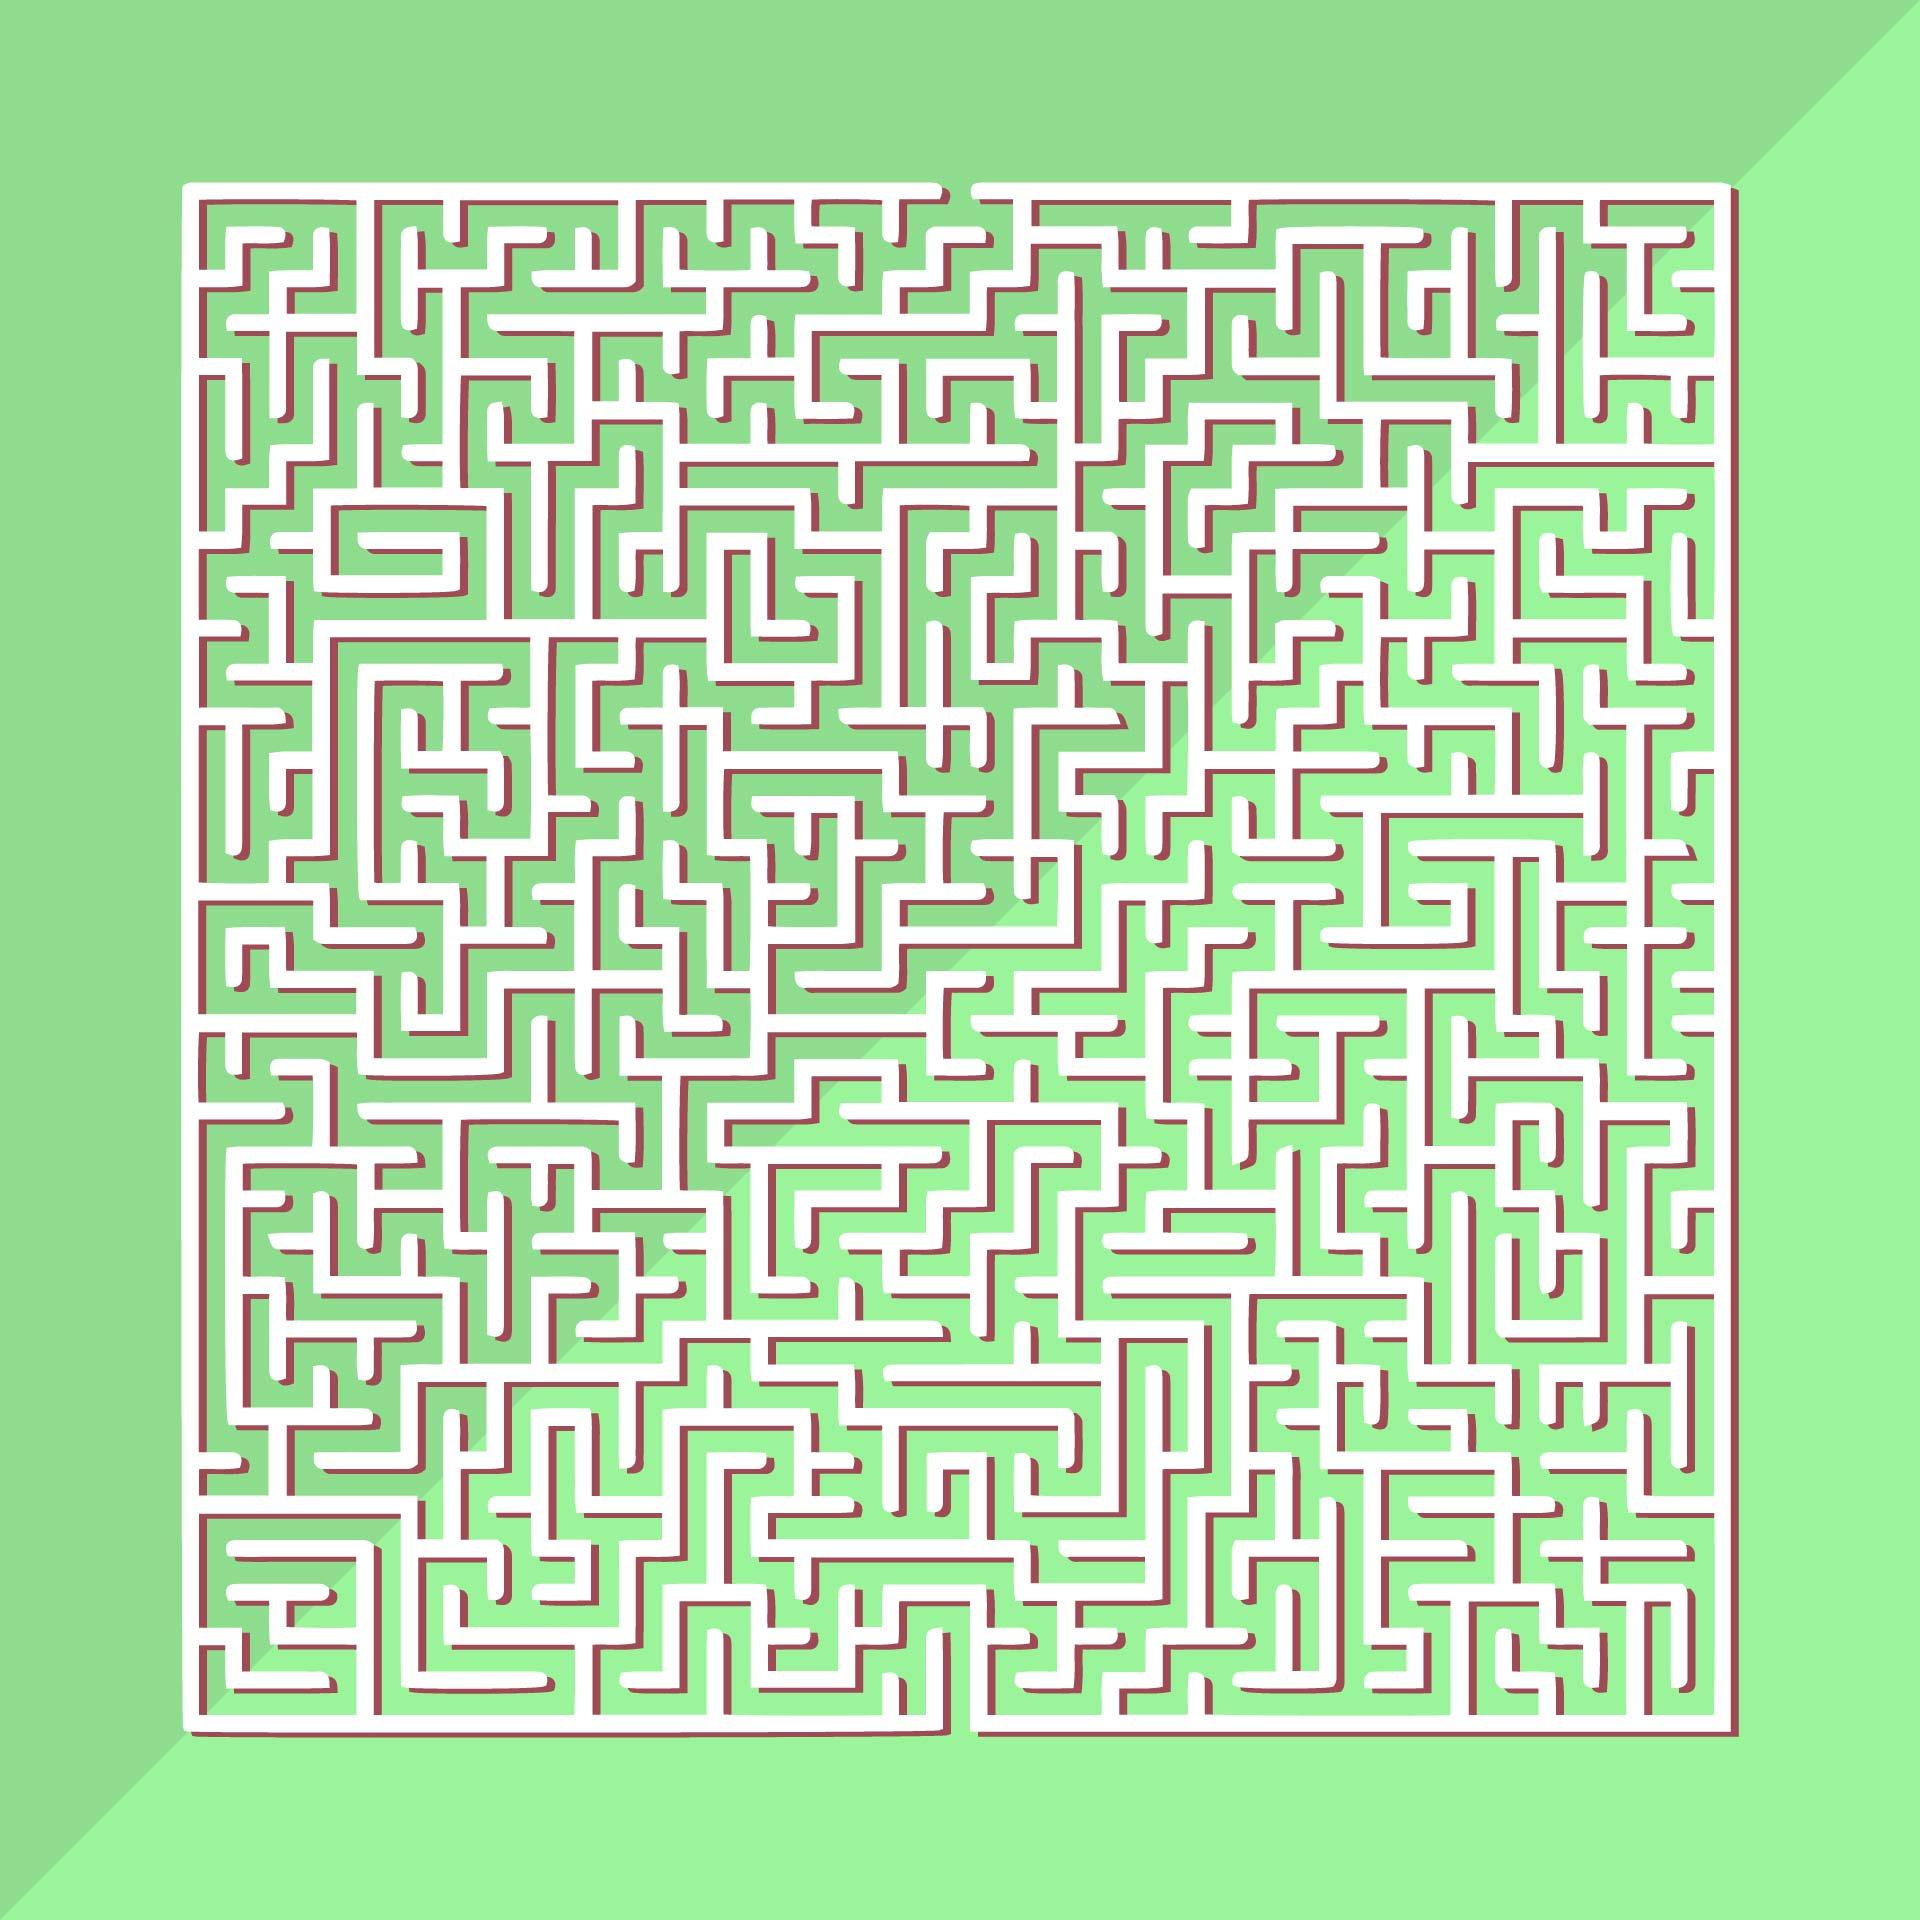 Printable Hard Mazes to Print